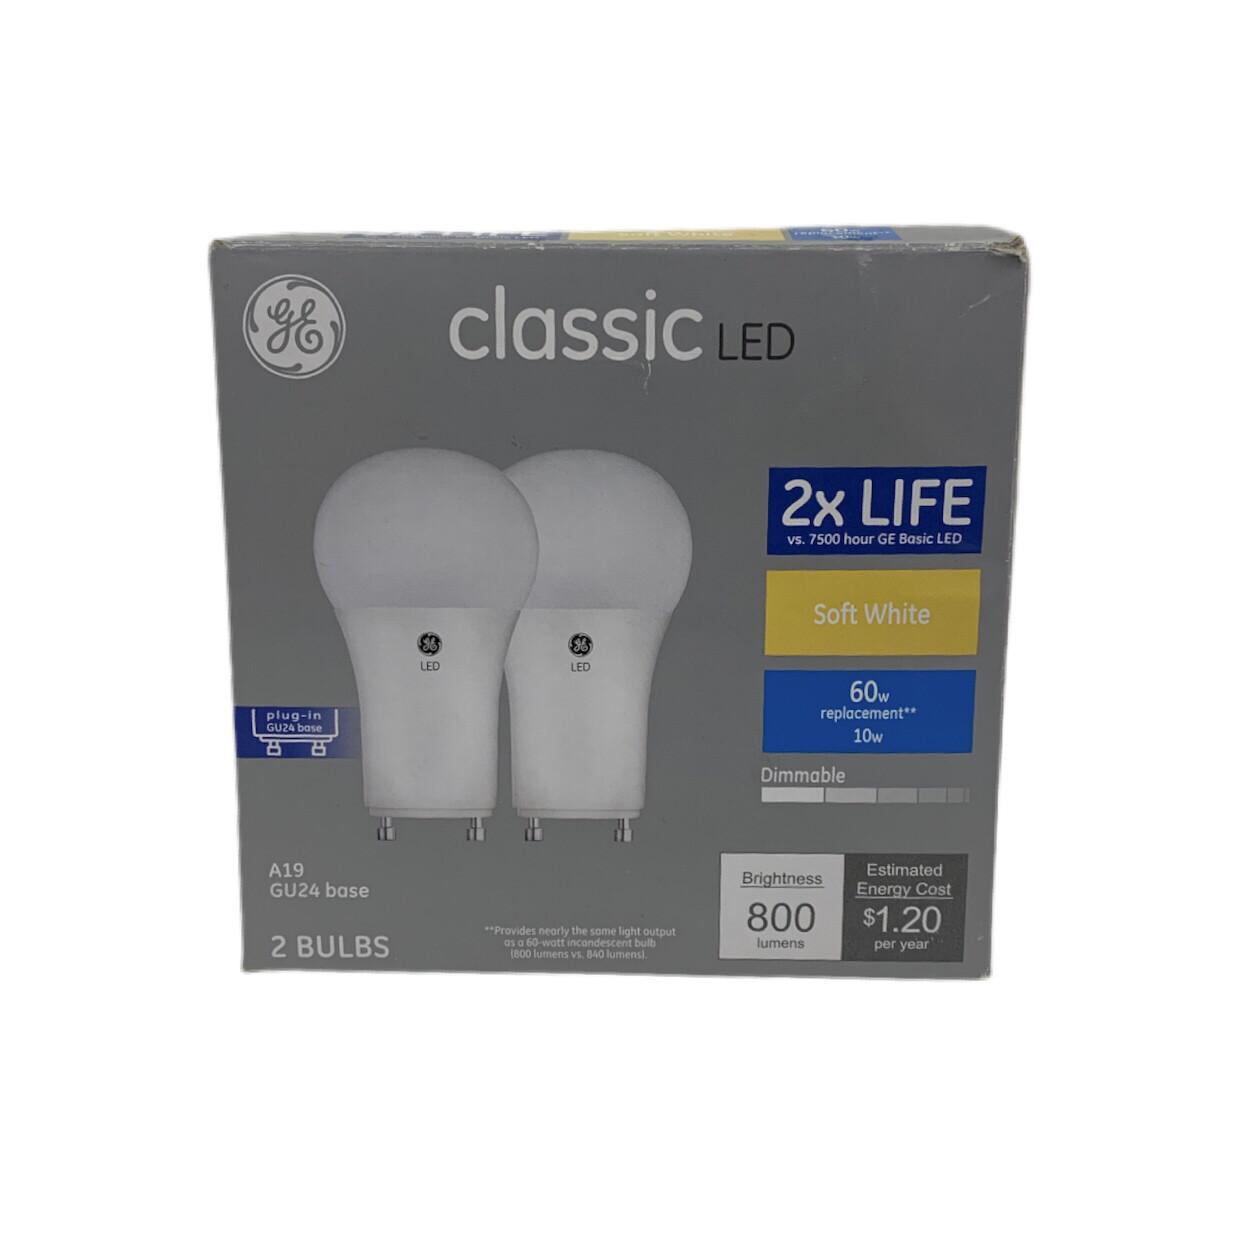 GE Classic LED GU24 Base Soft White Light Bulb 2 Pack